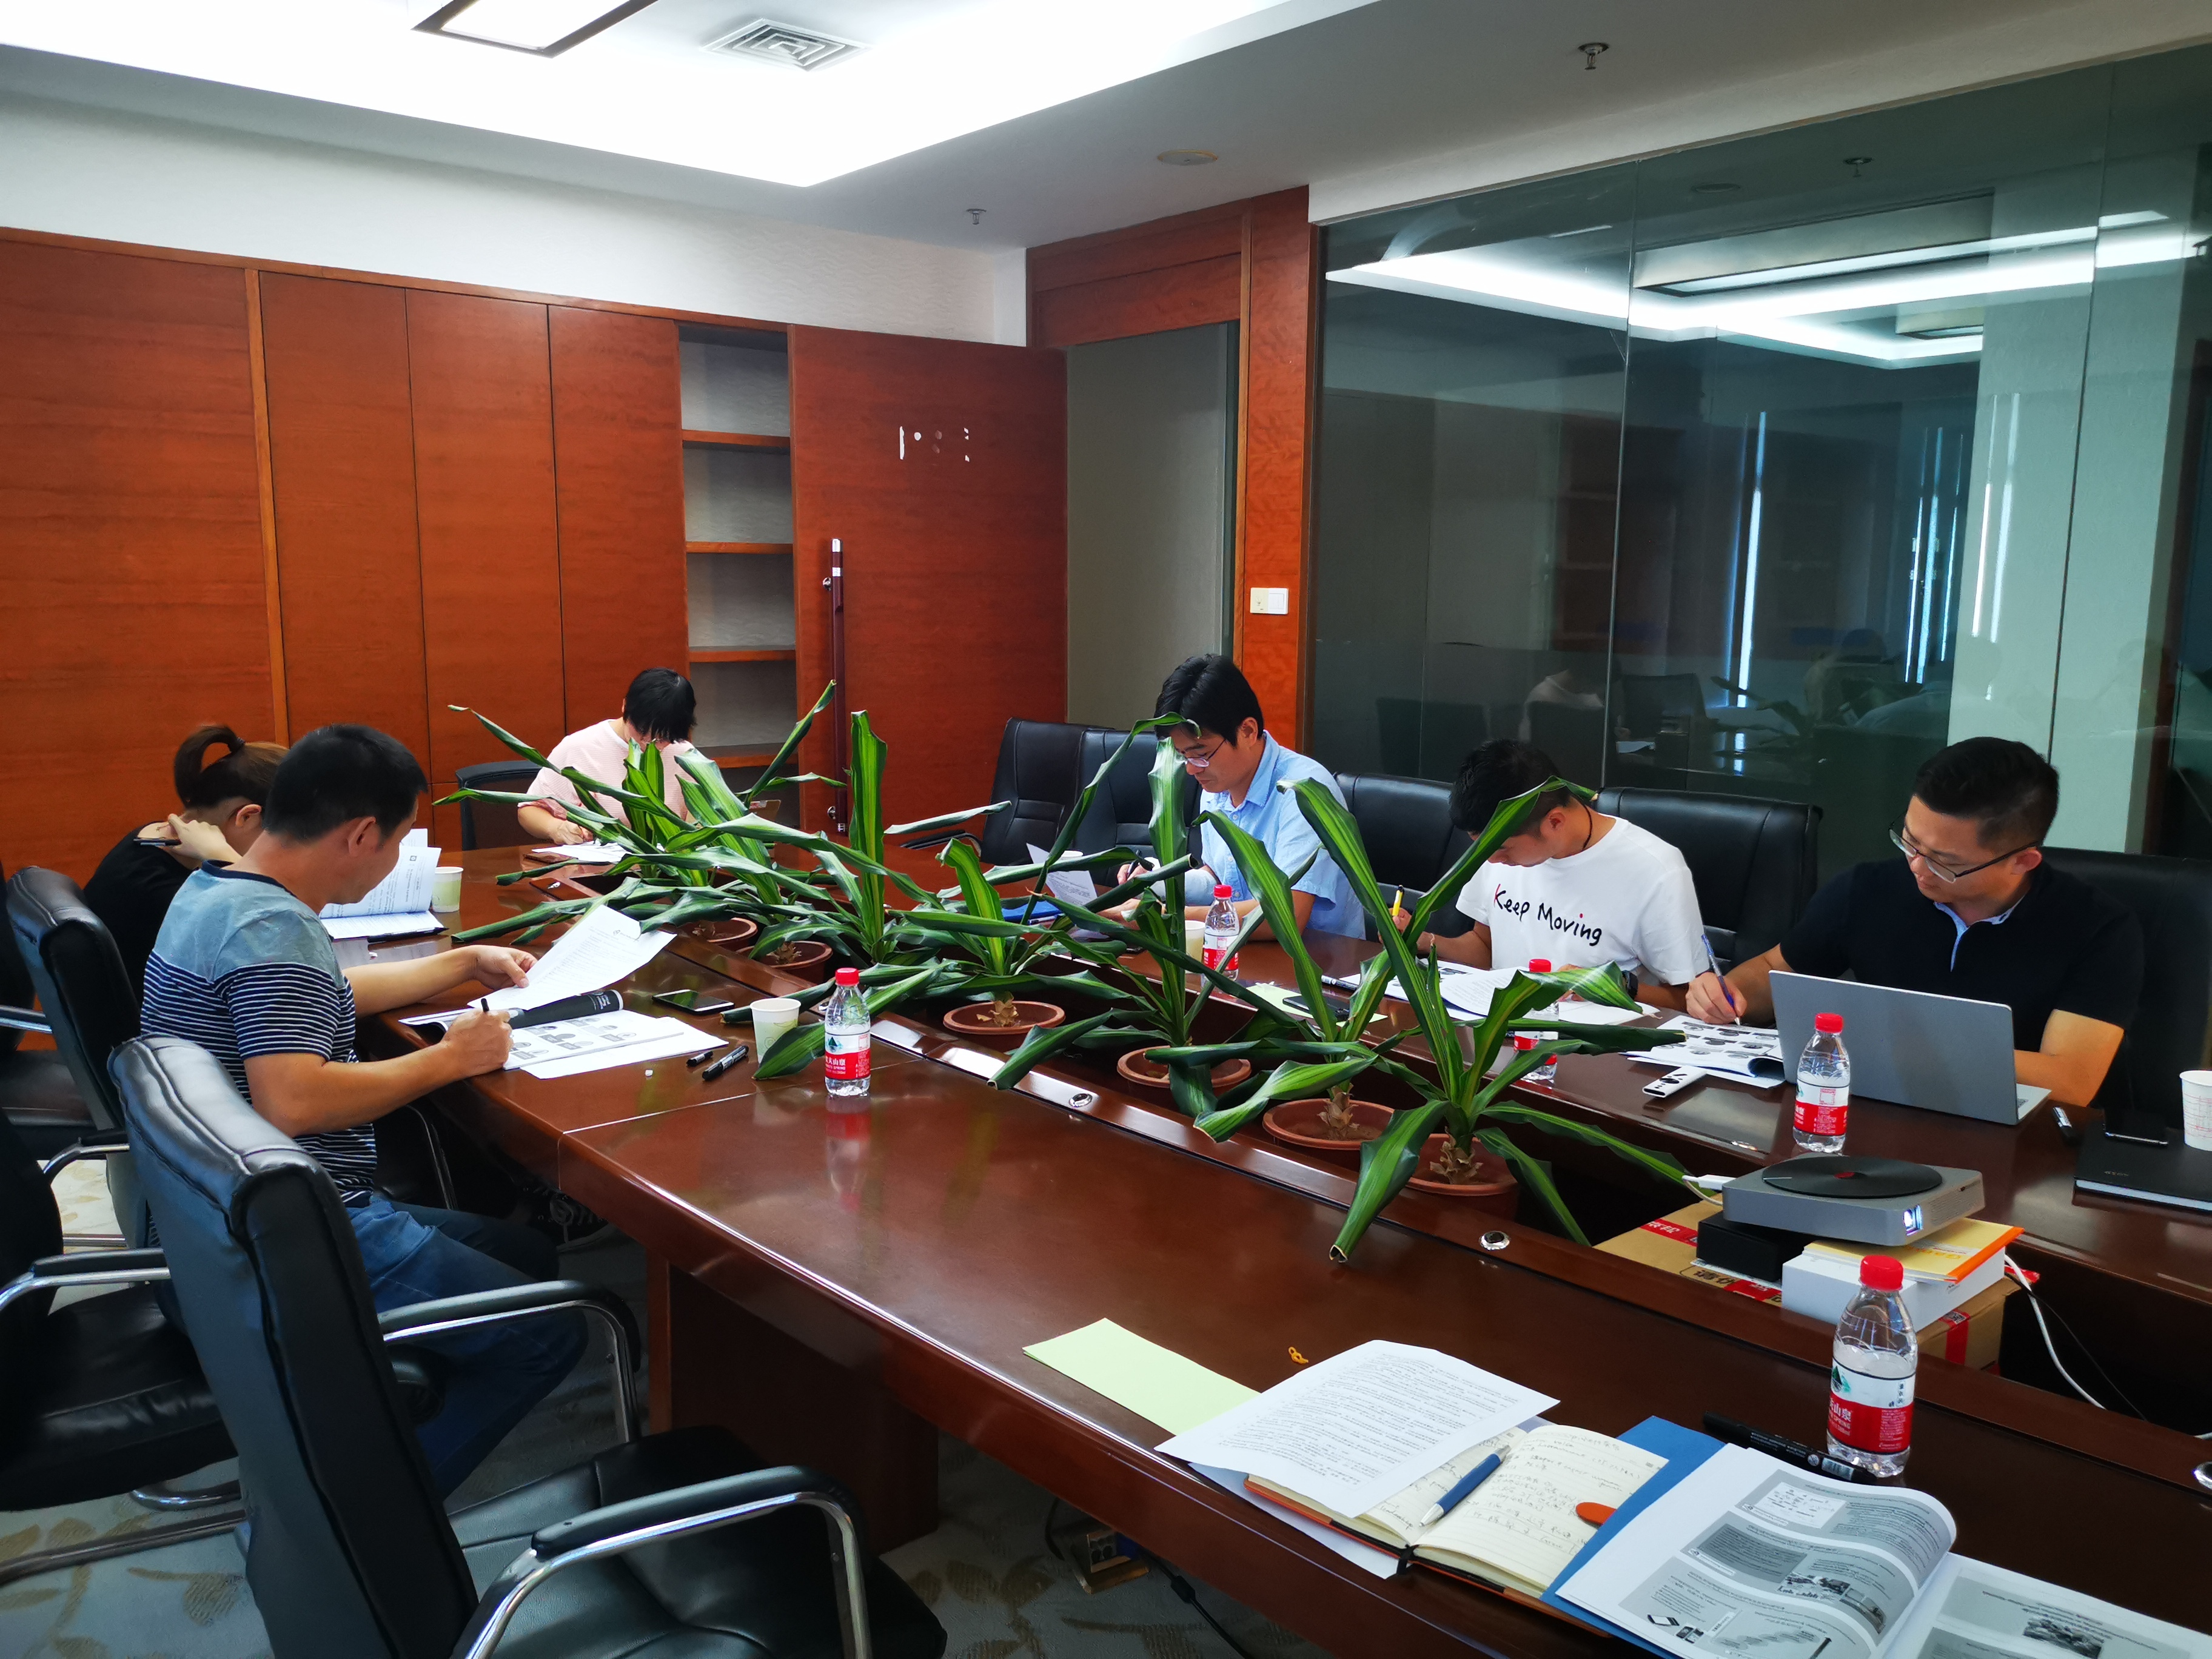 Eti china training november 2020